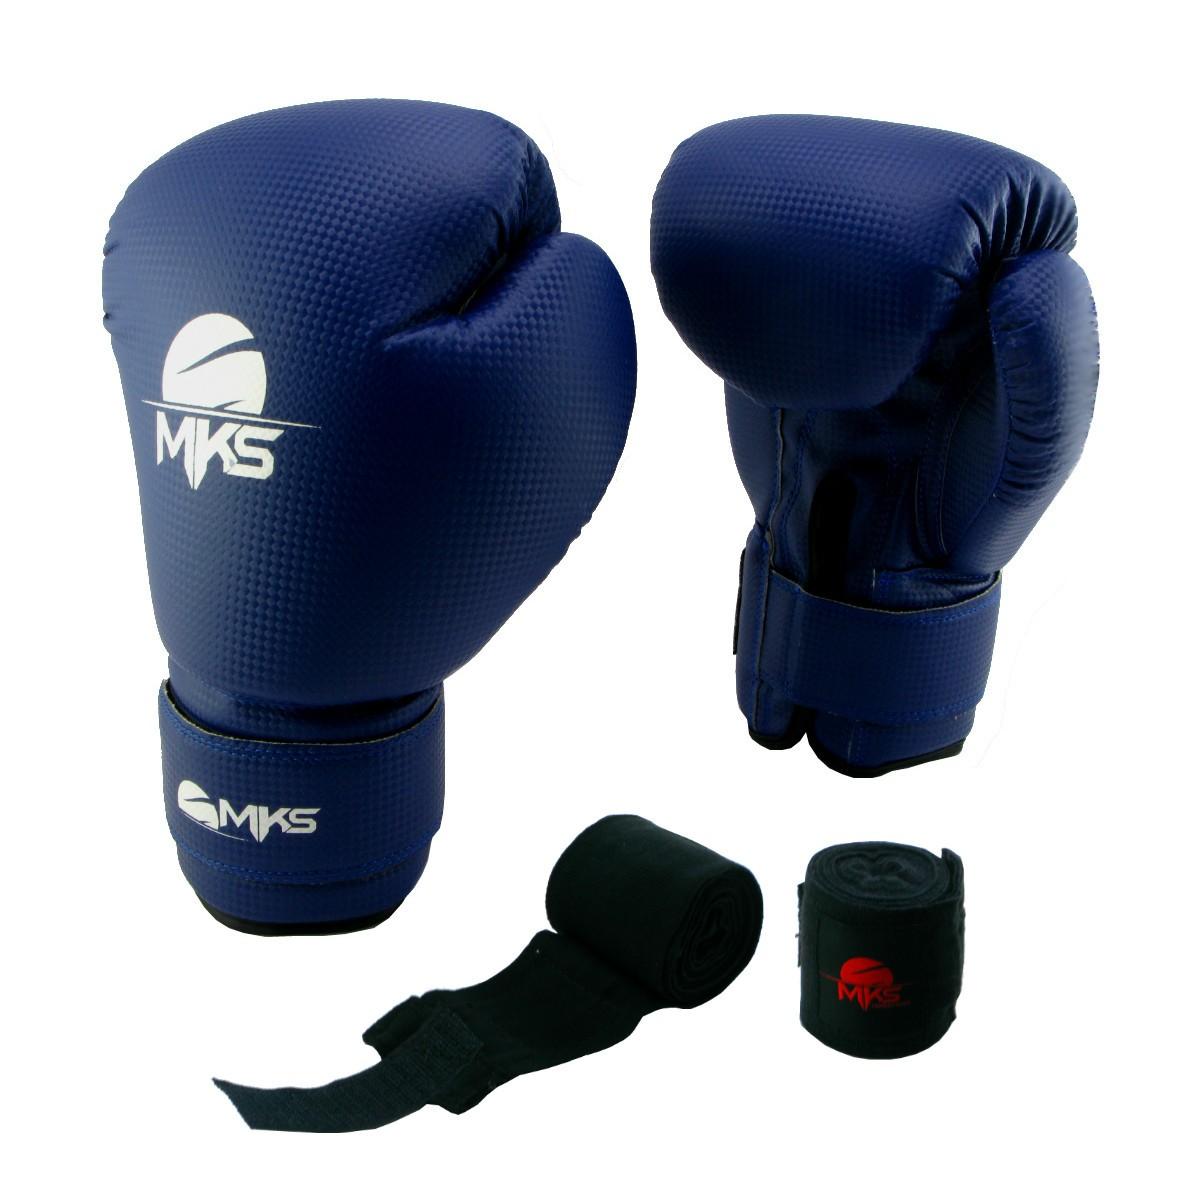 Luva de Boxe Prospect MKS Blue 12 oz + bandagem